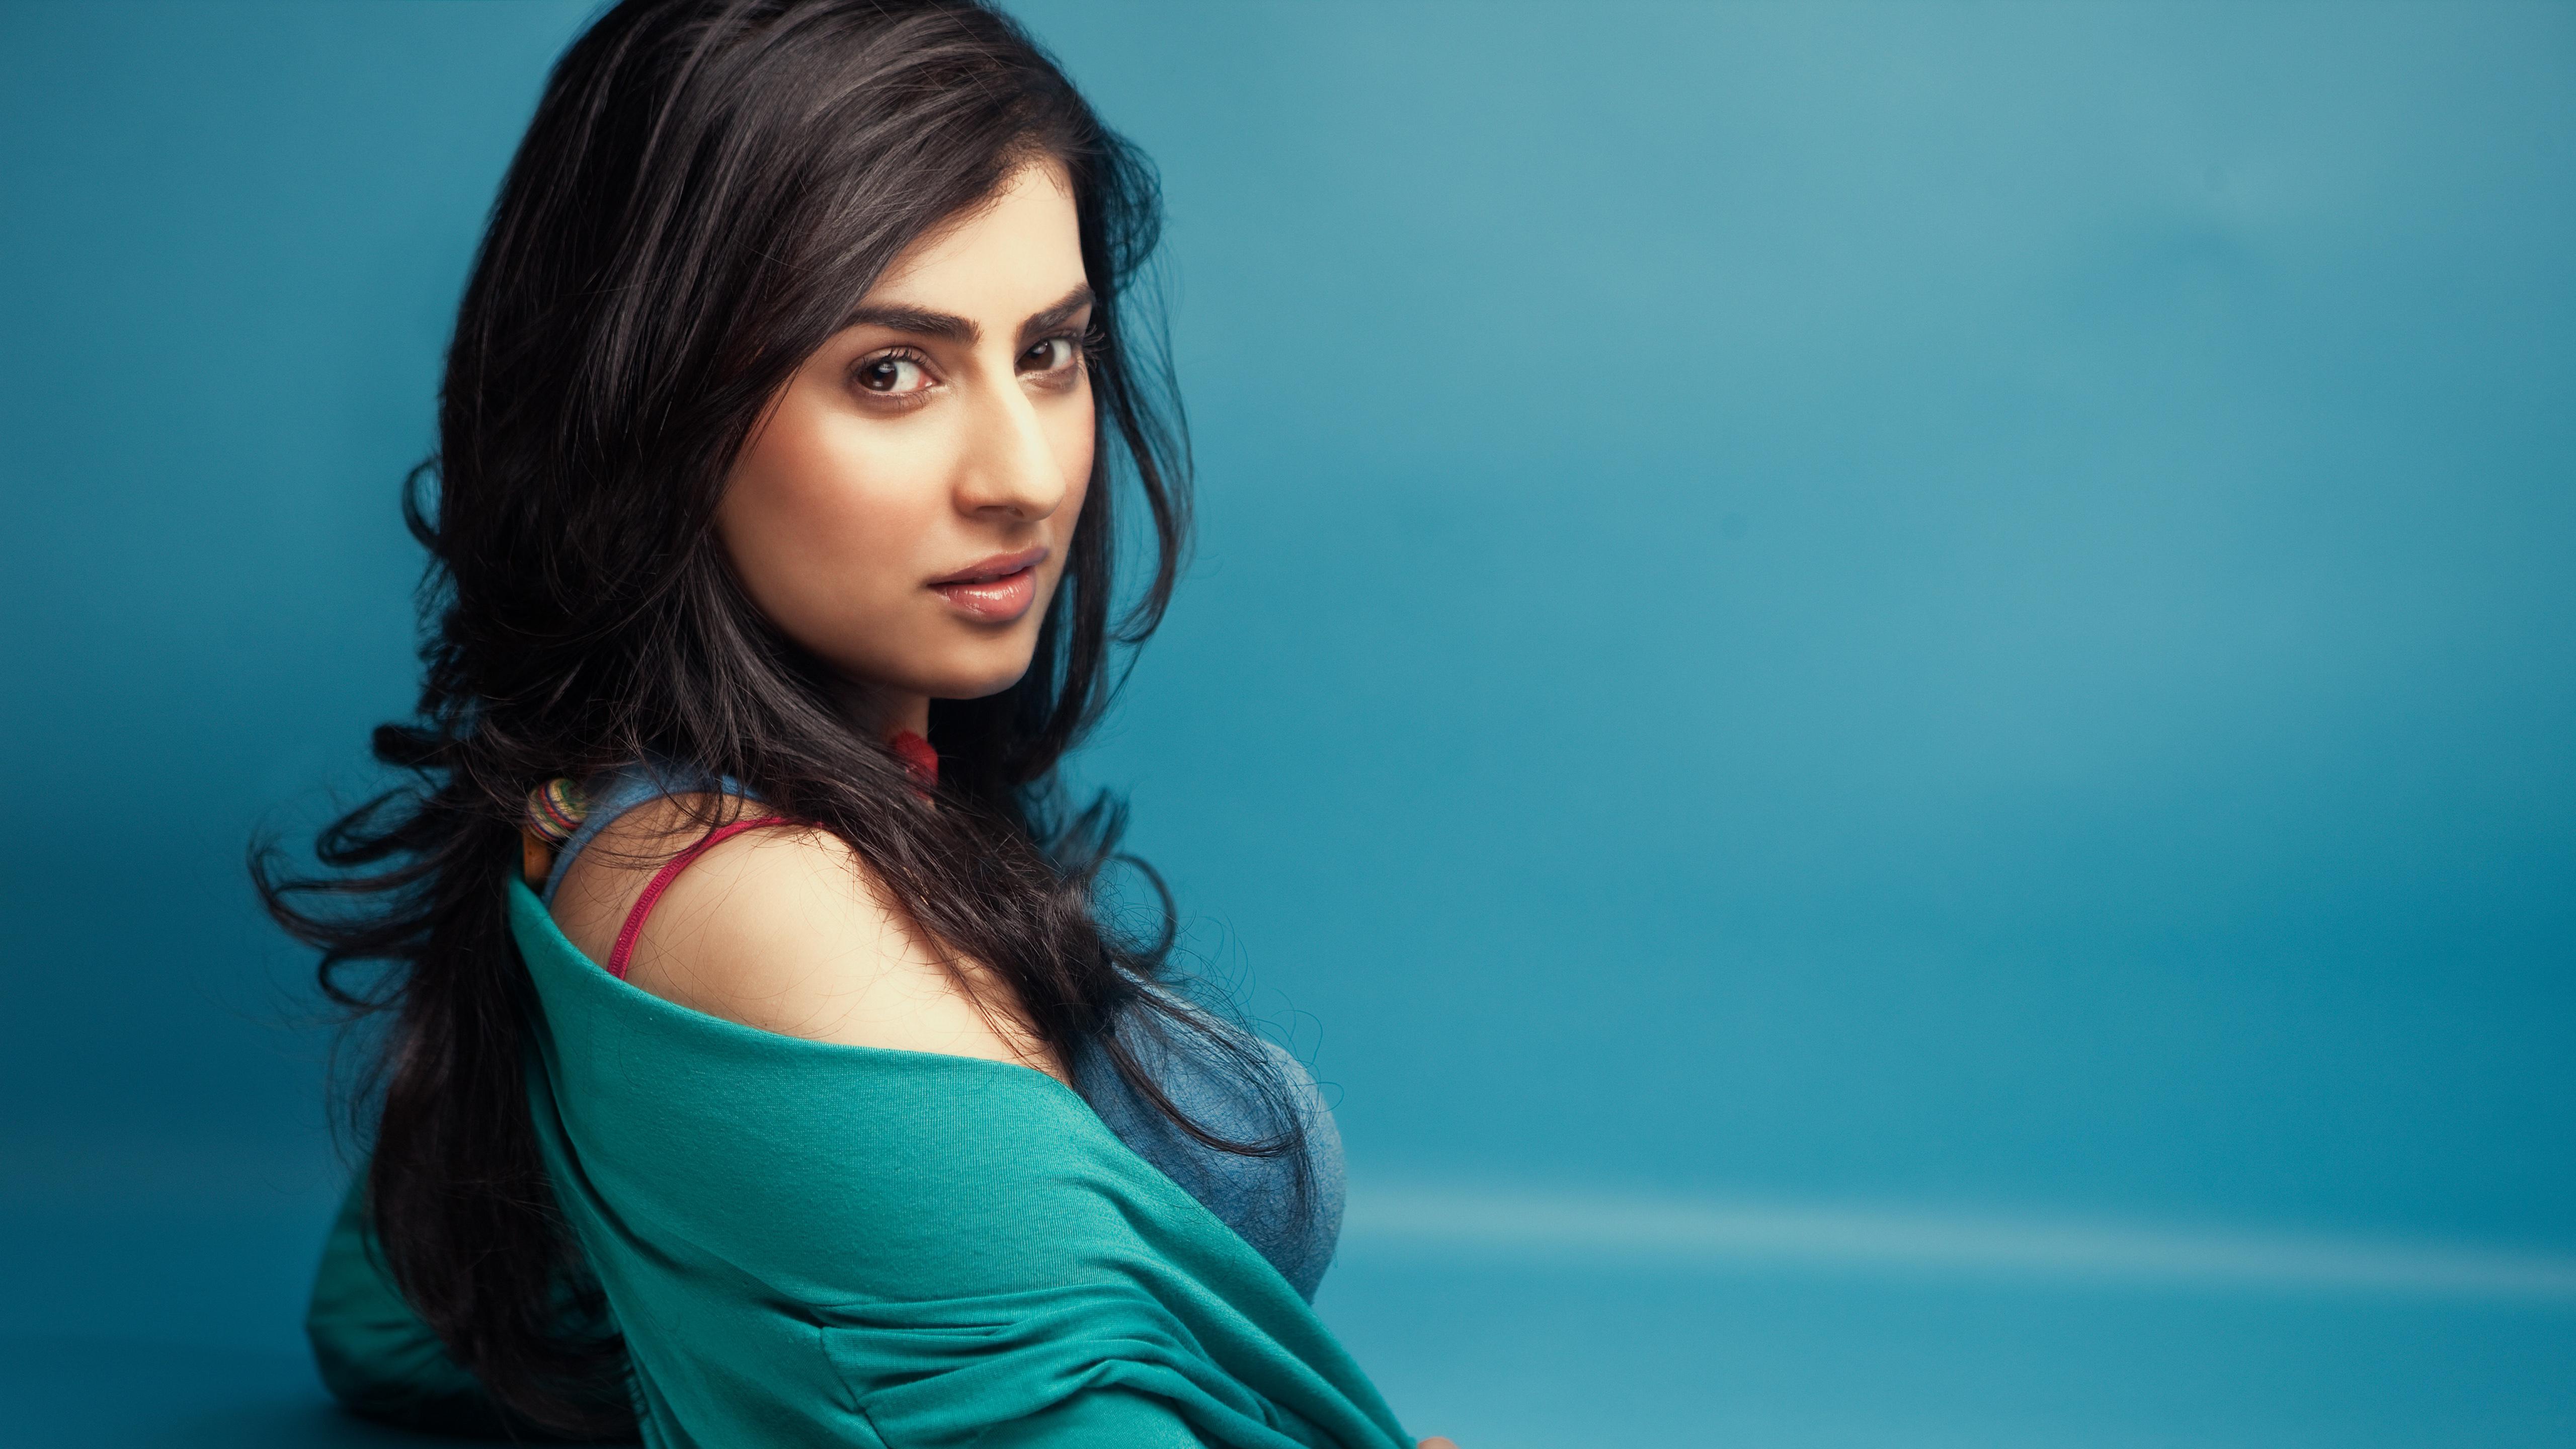 Actress Archana Veda 4K wallpaper